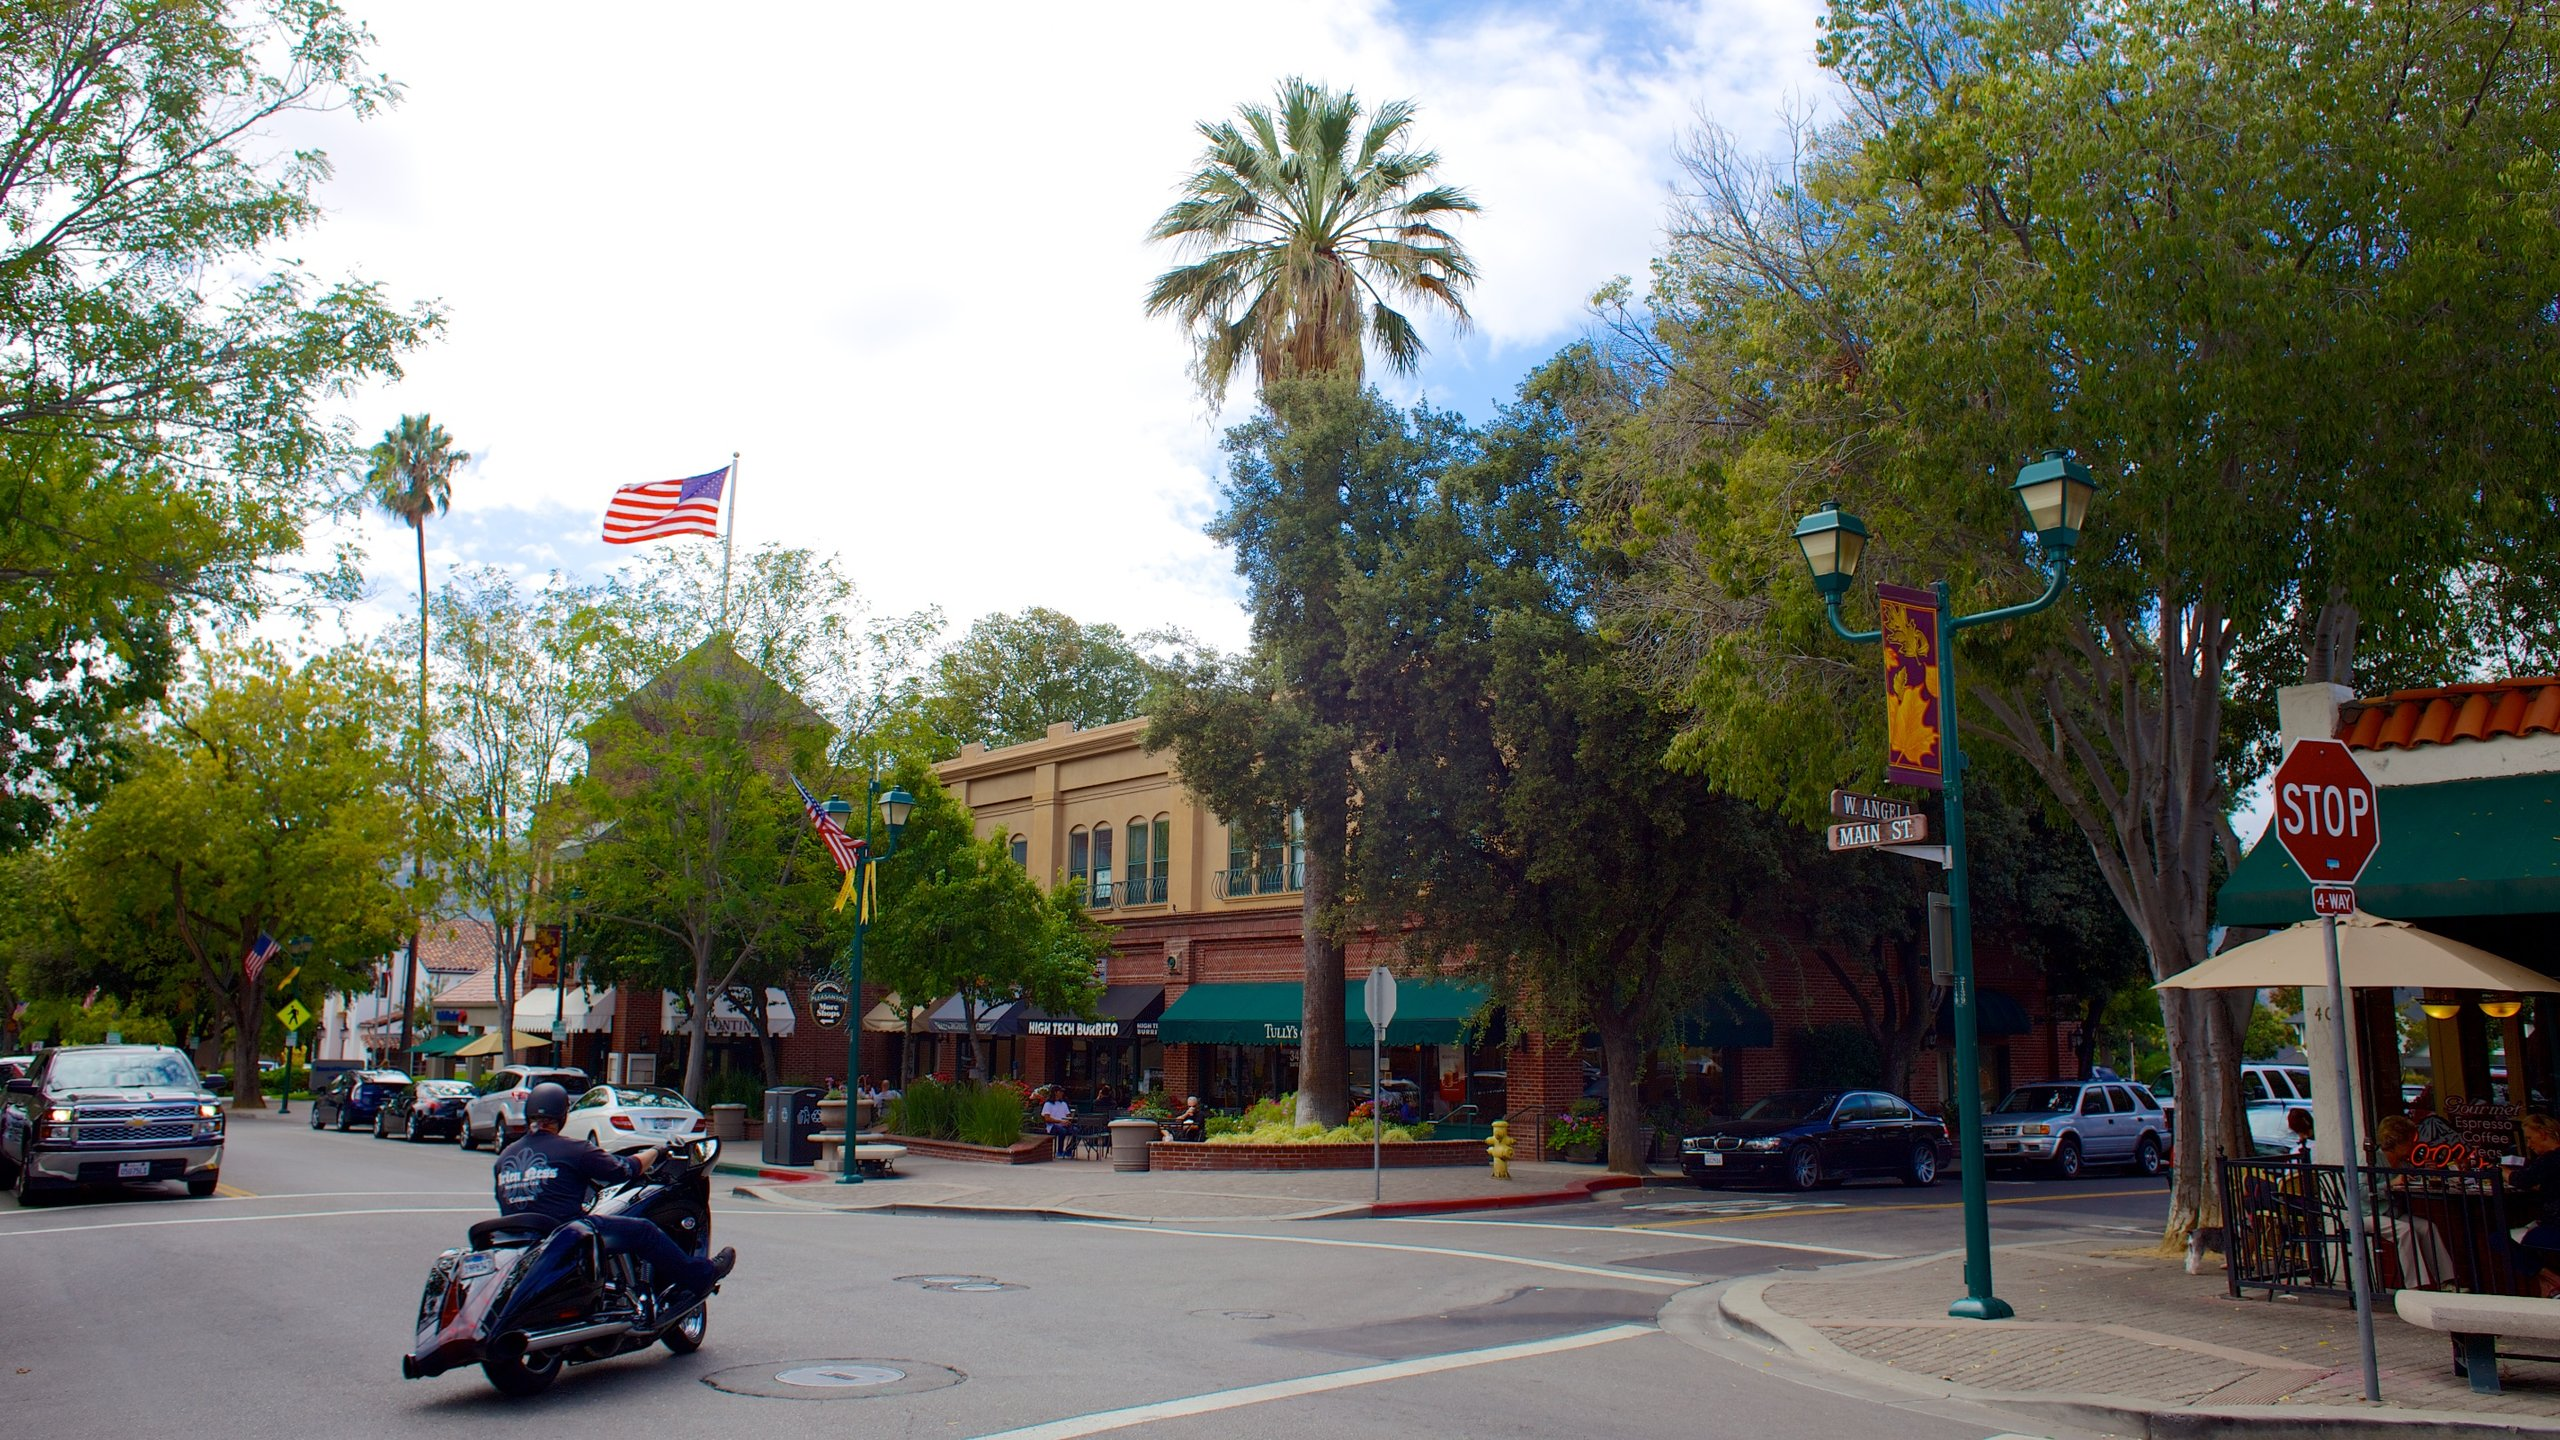 Cheap Hotels in Pleasanton - Livermore - Find $63 Hotel